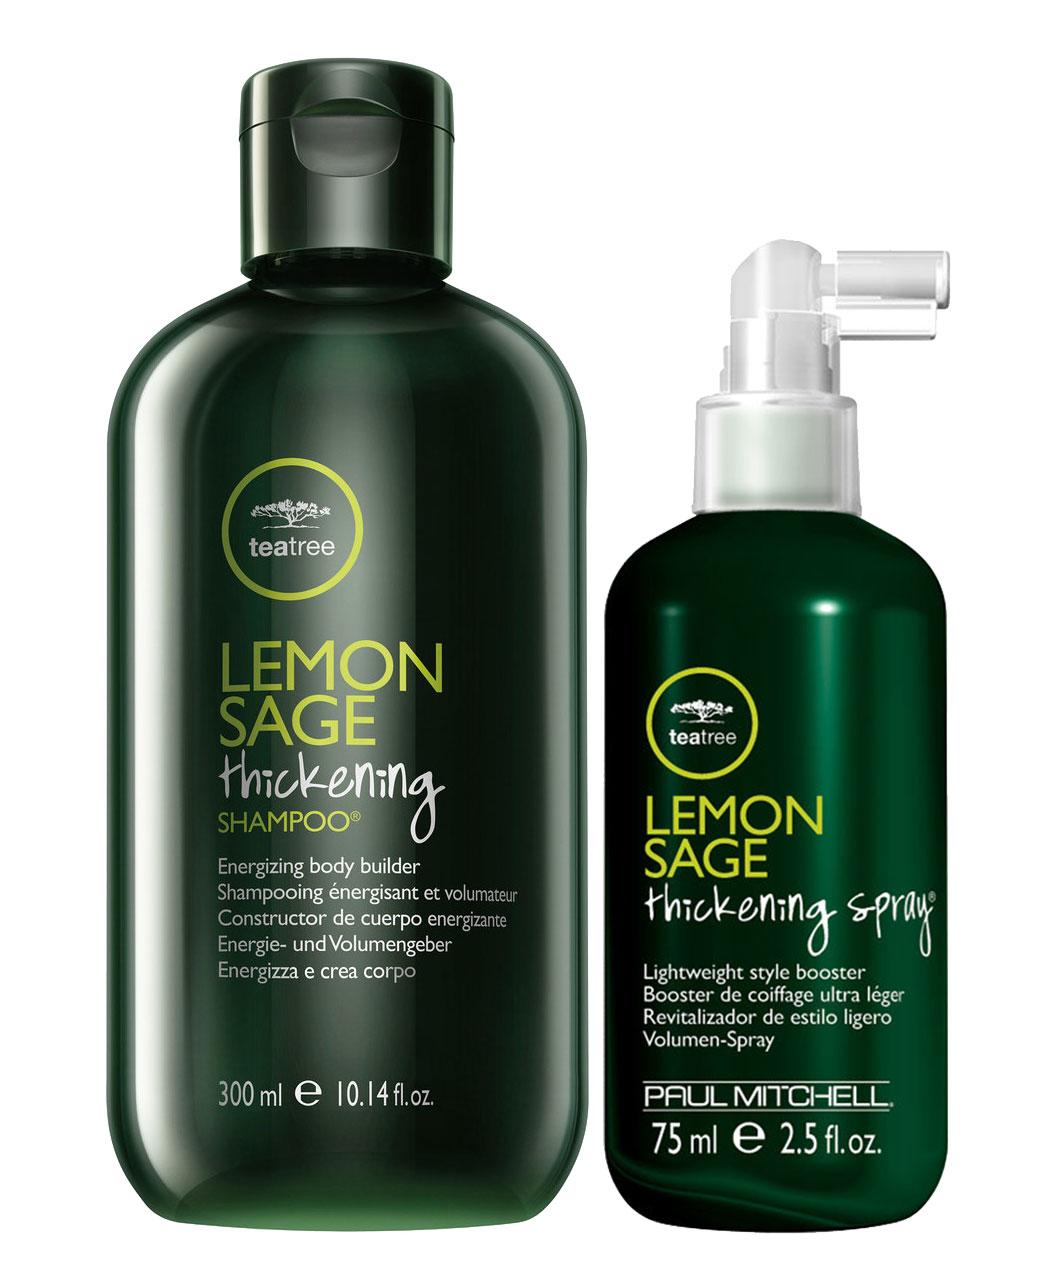 Paul Mitchell Lemon Sage Thickening Travel Size Duo Set - Shampoo 300ml + Spray 75ml